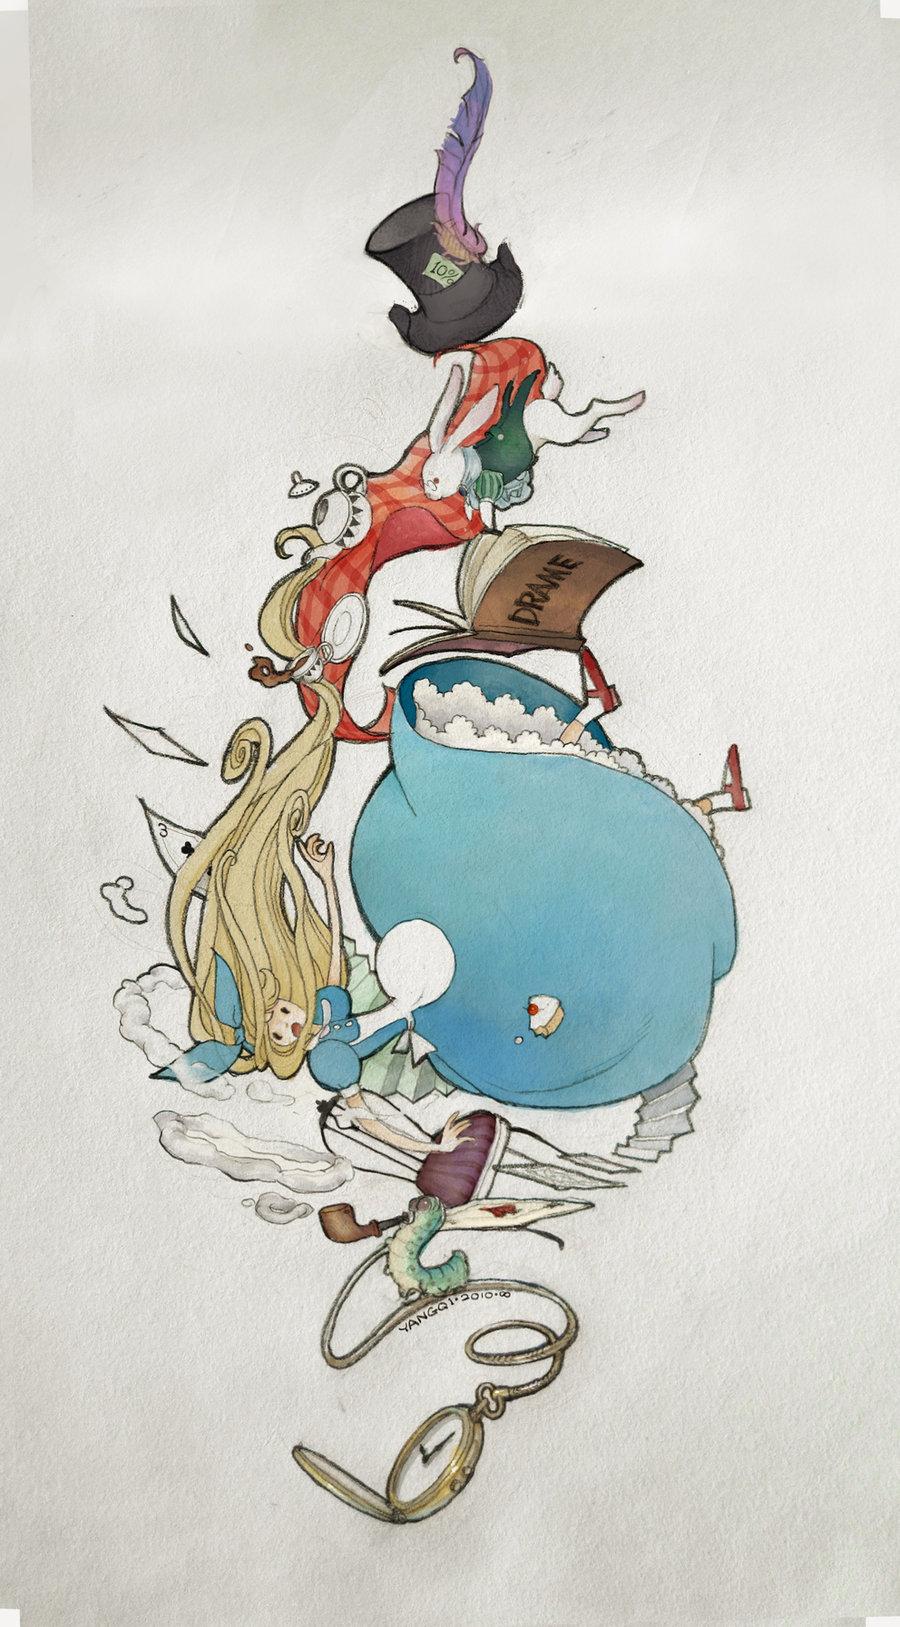 Alice In Wonderland Mobile Wallpaper 678720 Zerochan